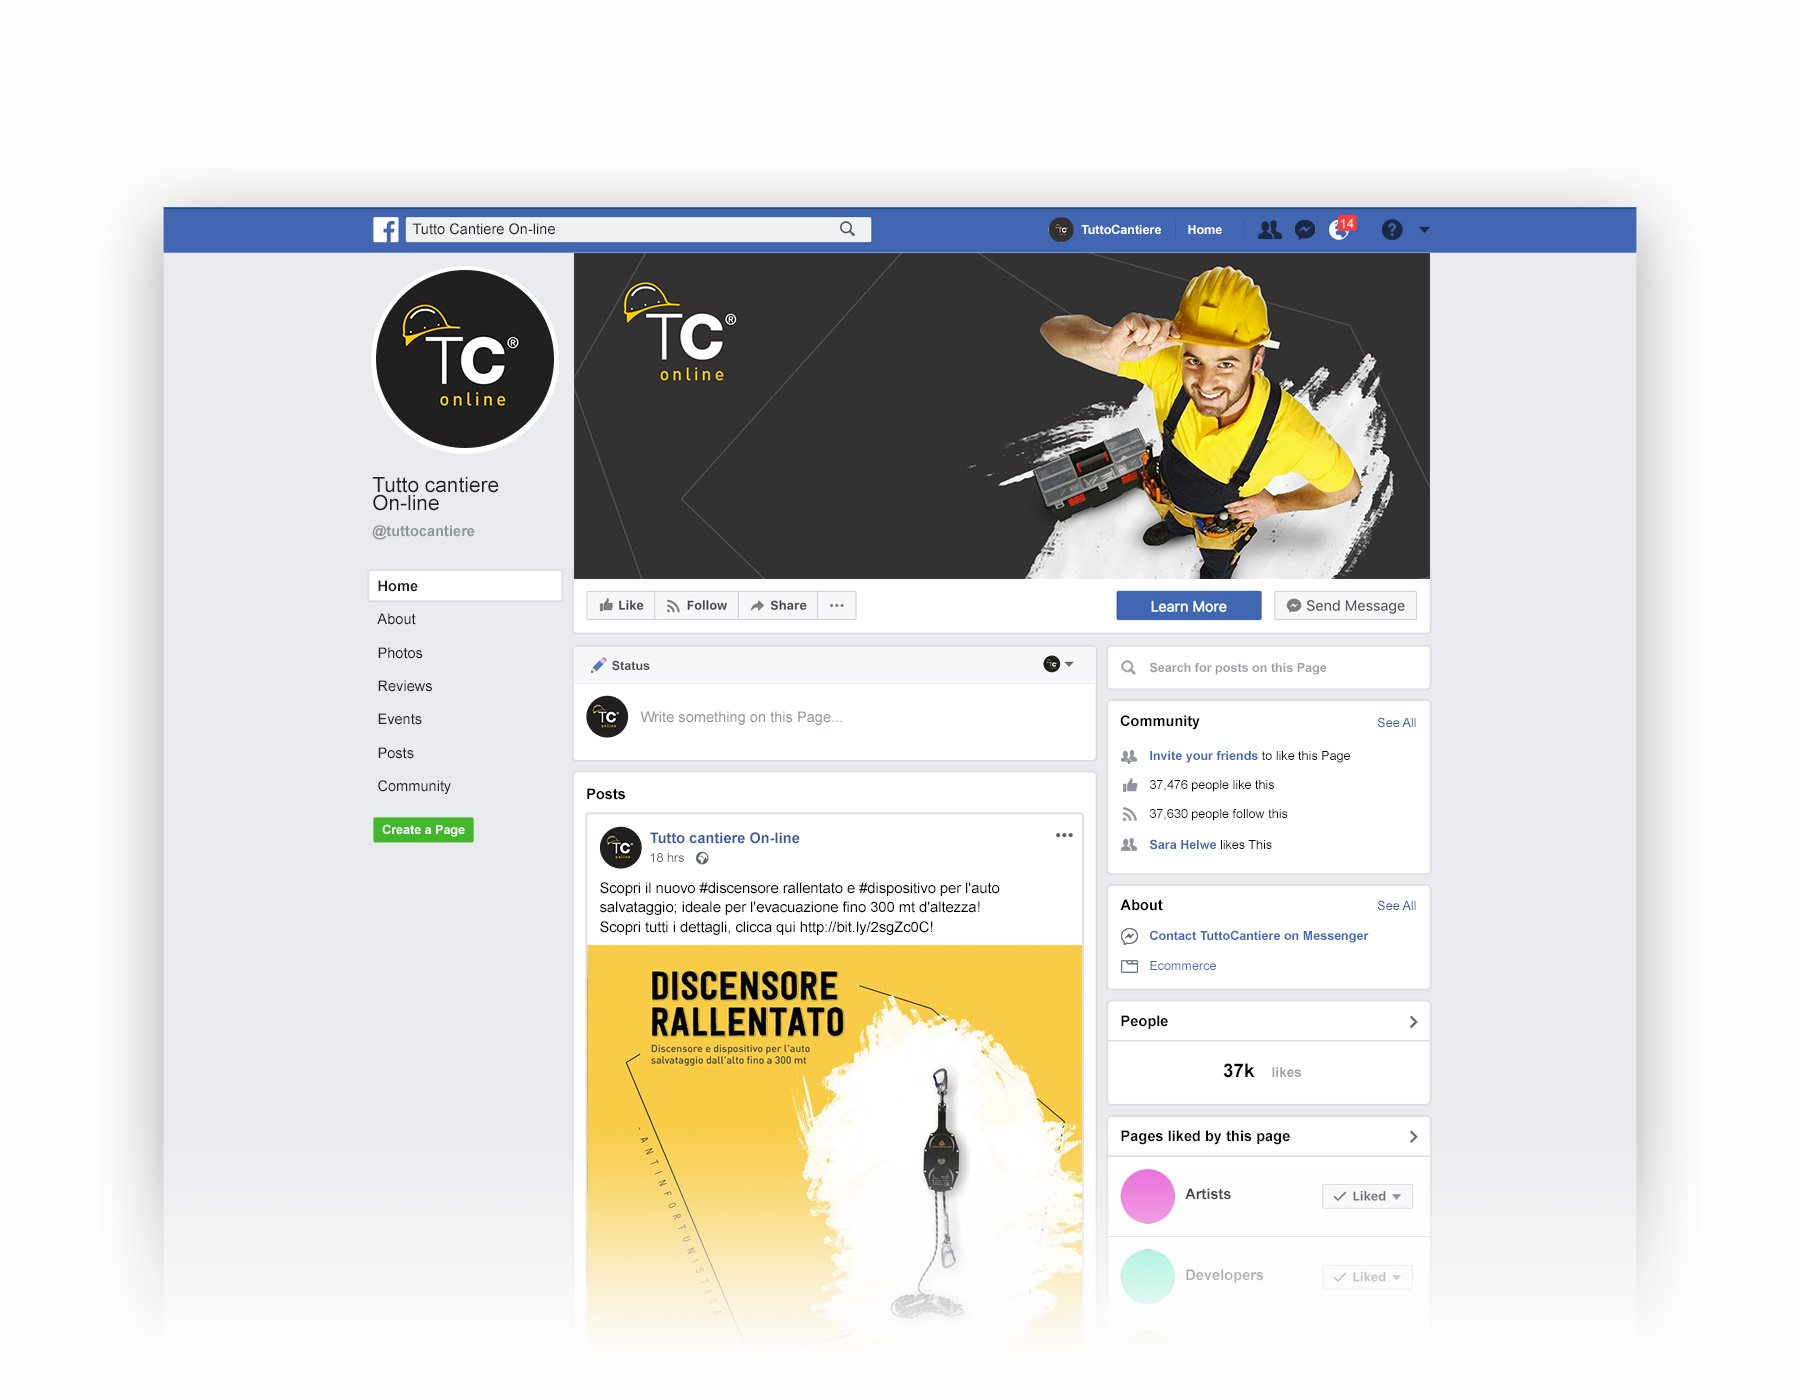 BriefMe_TCO_img_fbpage